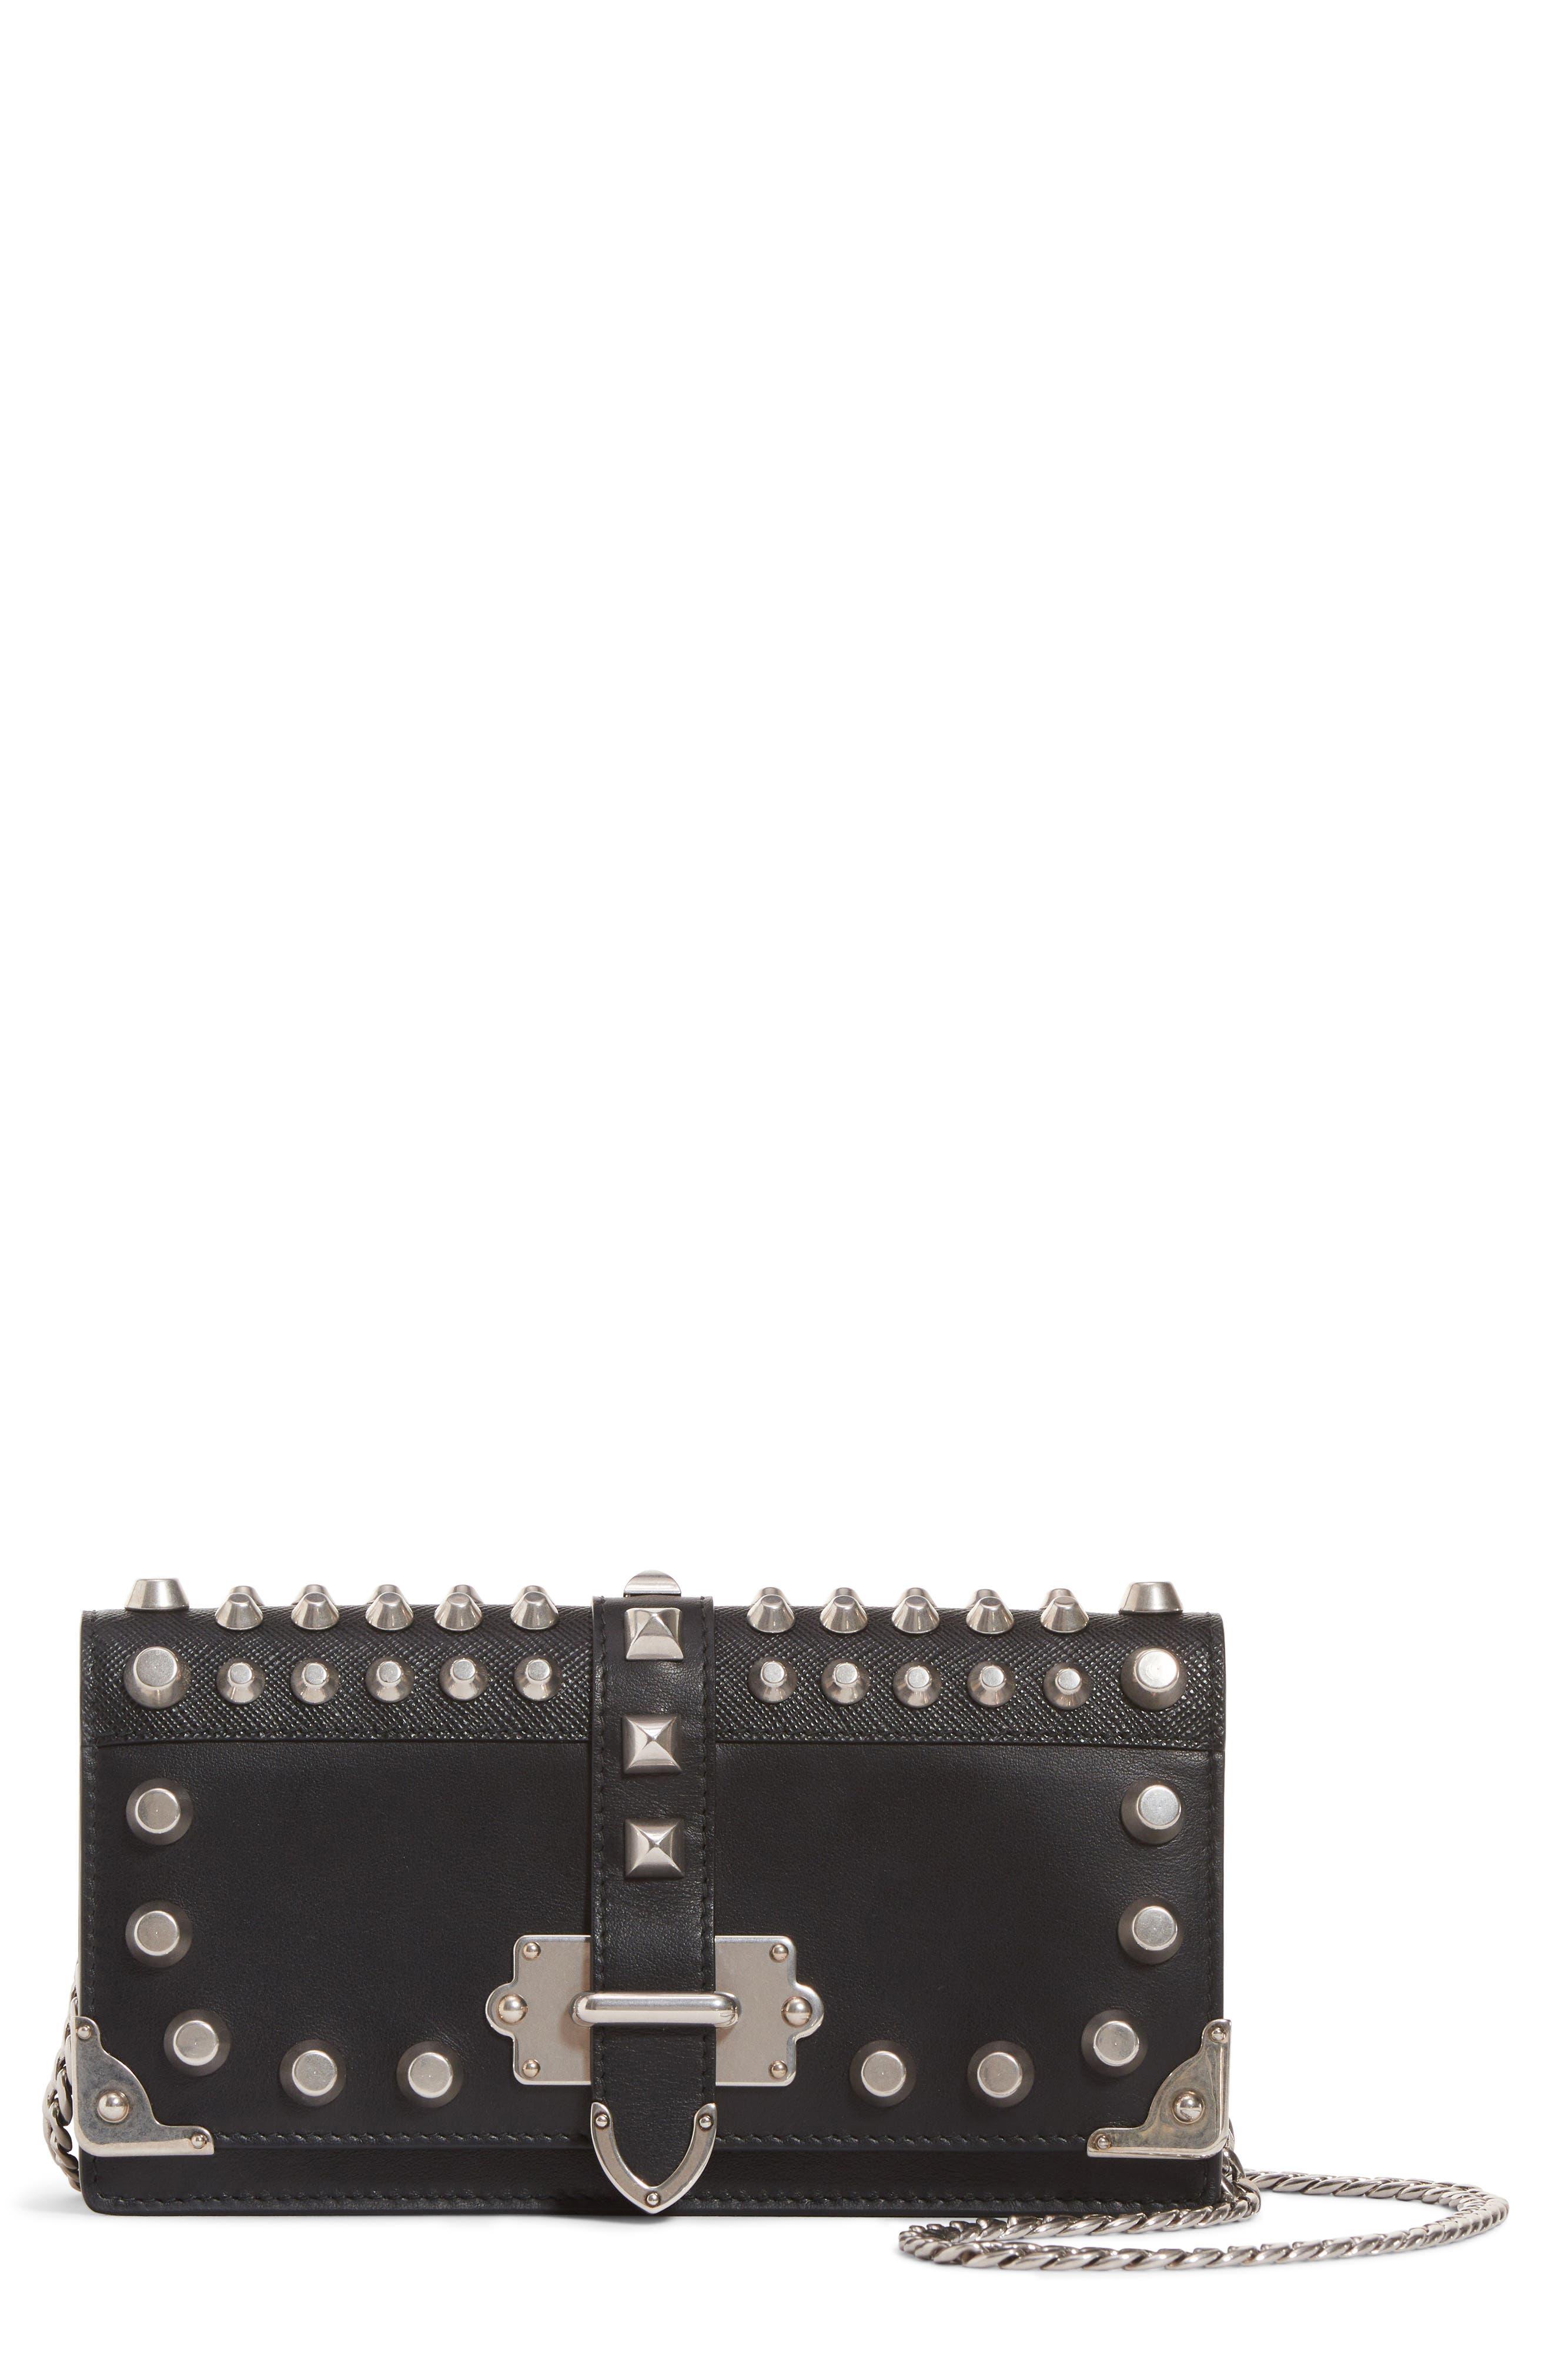 ec7ef6128d66 ... best prada cahier leather wallet on a chain ca0b9 b3935